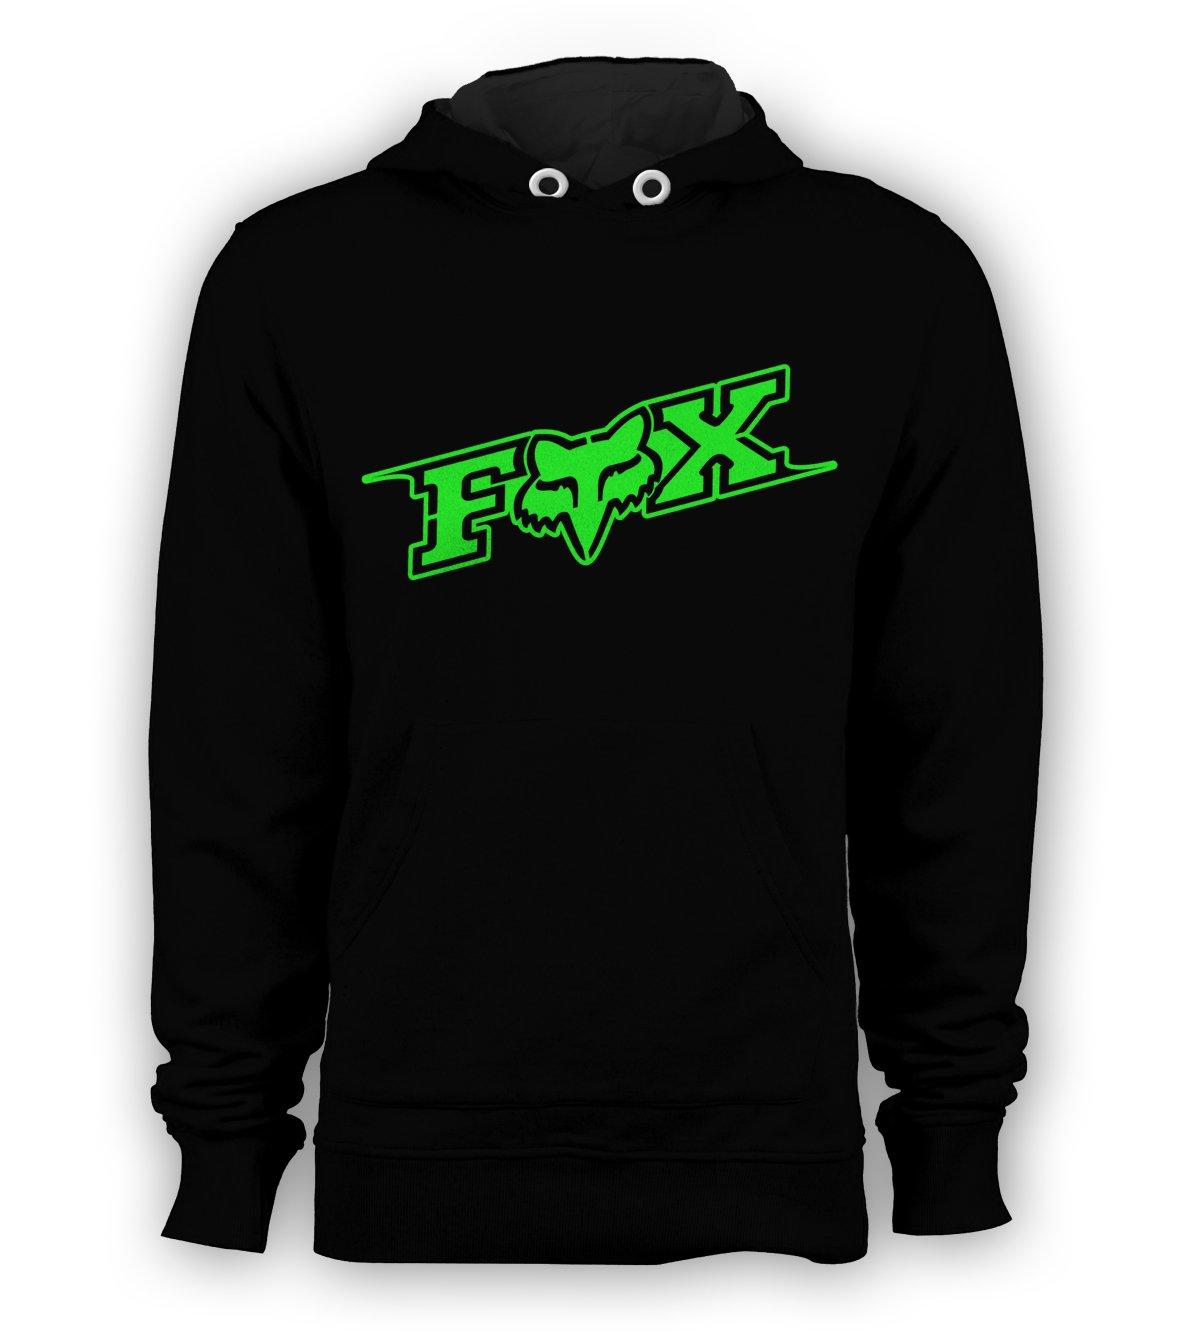 Fox Racing Green Logo Pullover Hoodie Men BMX Skateboard X-Games Sweatshirts Size S to 3XL New Black